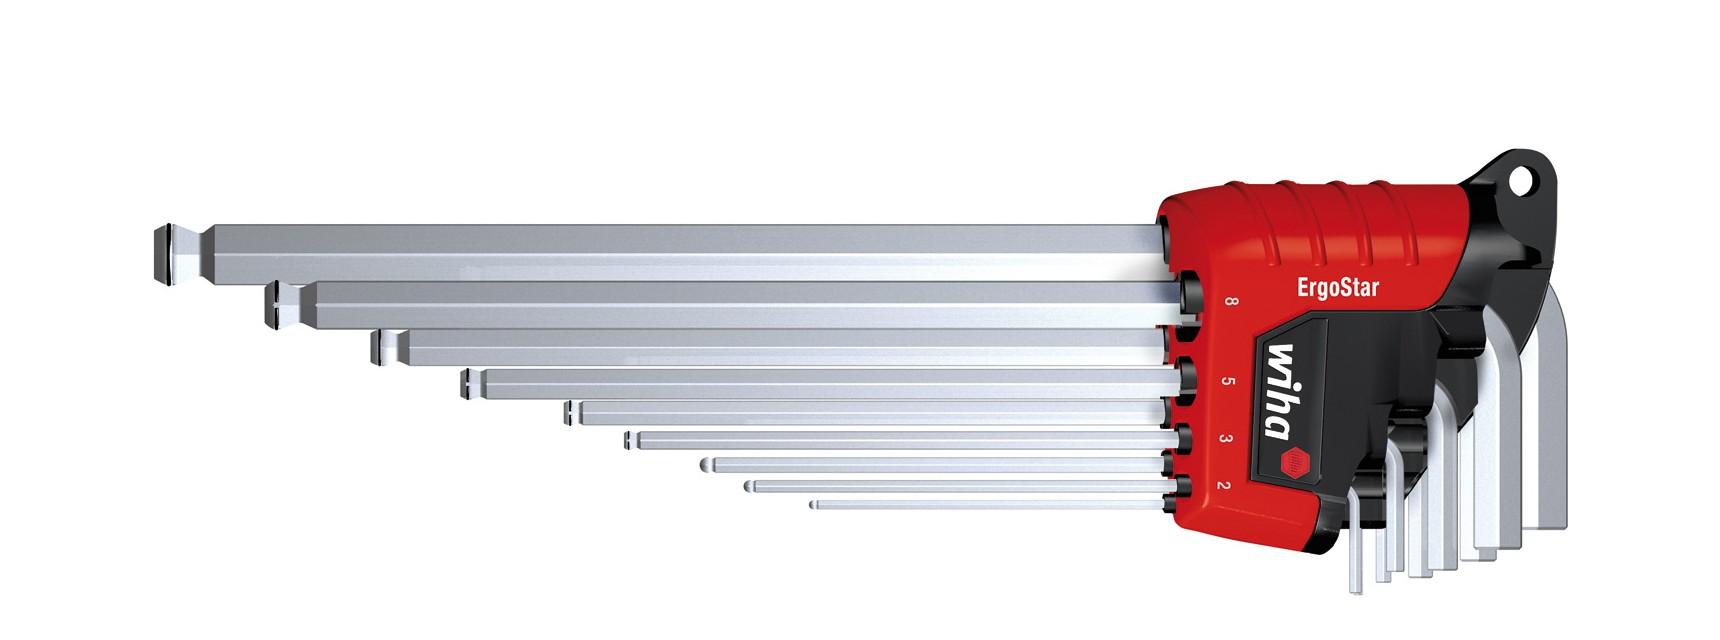 stiftschluessel-369R_H9.jpg